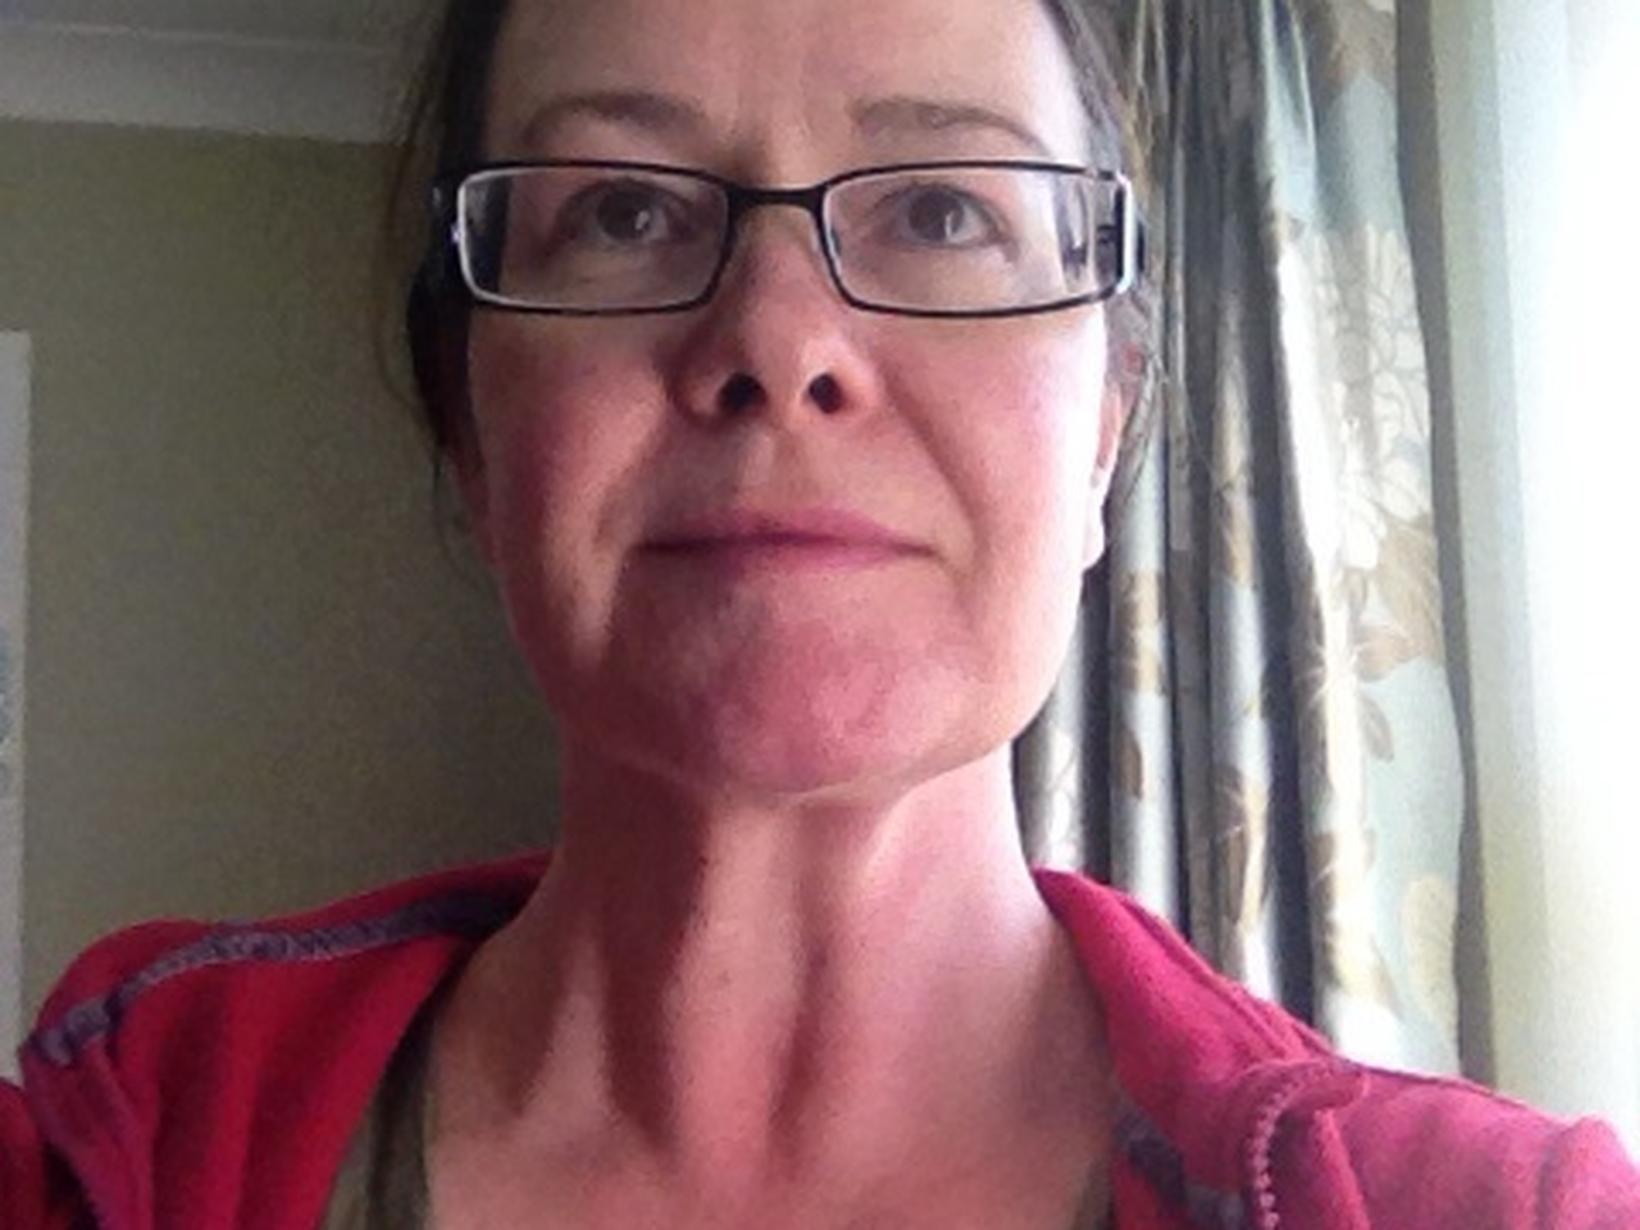 Patricia from York, United Kingdom